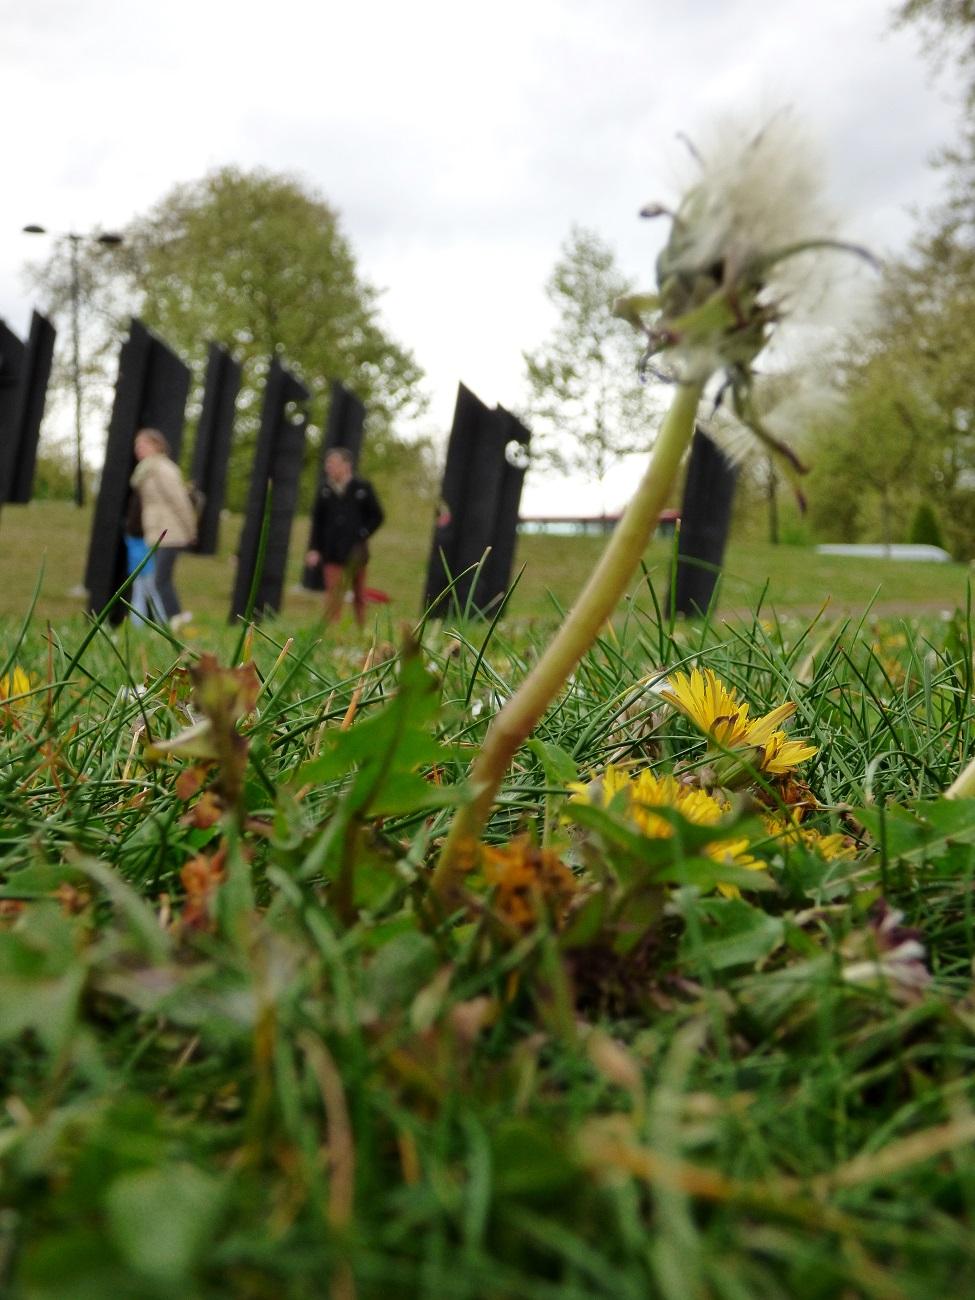 20170407_Westminster_New-Zealand-War-Memorial-Garden_Not-everything-in-life-is-clear